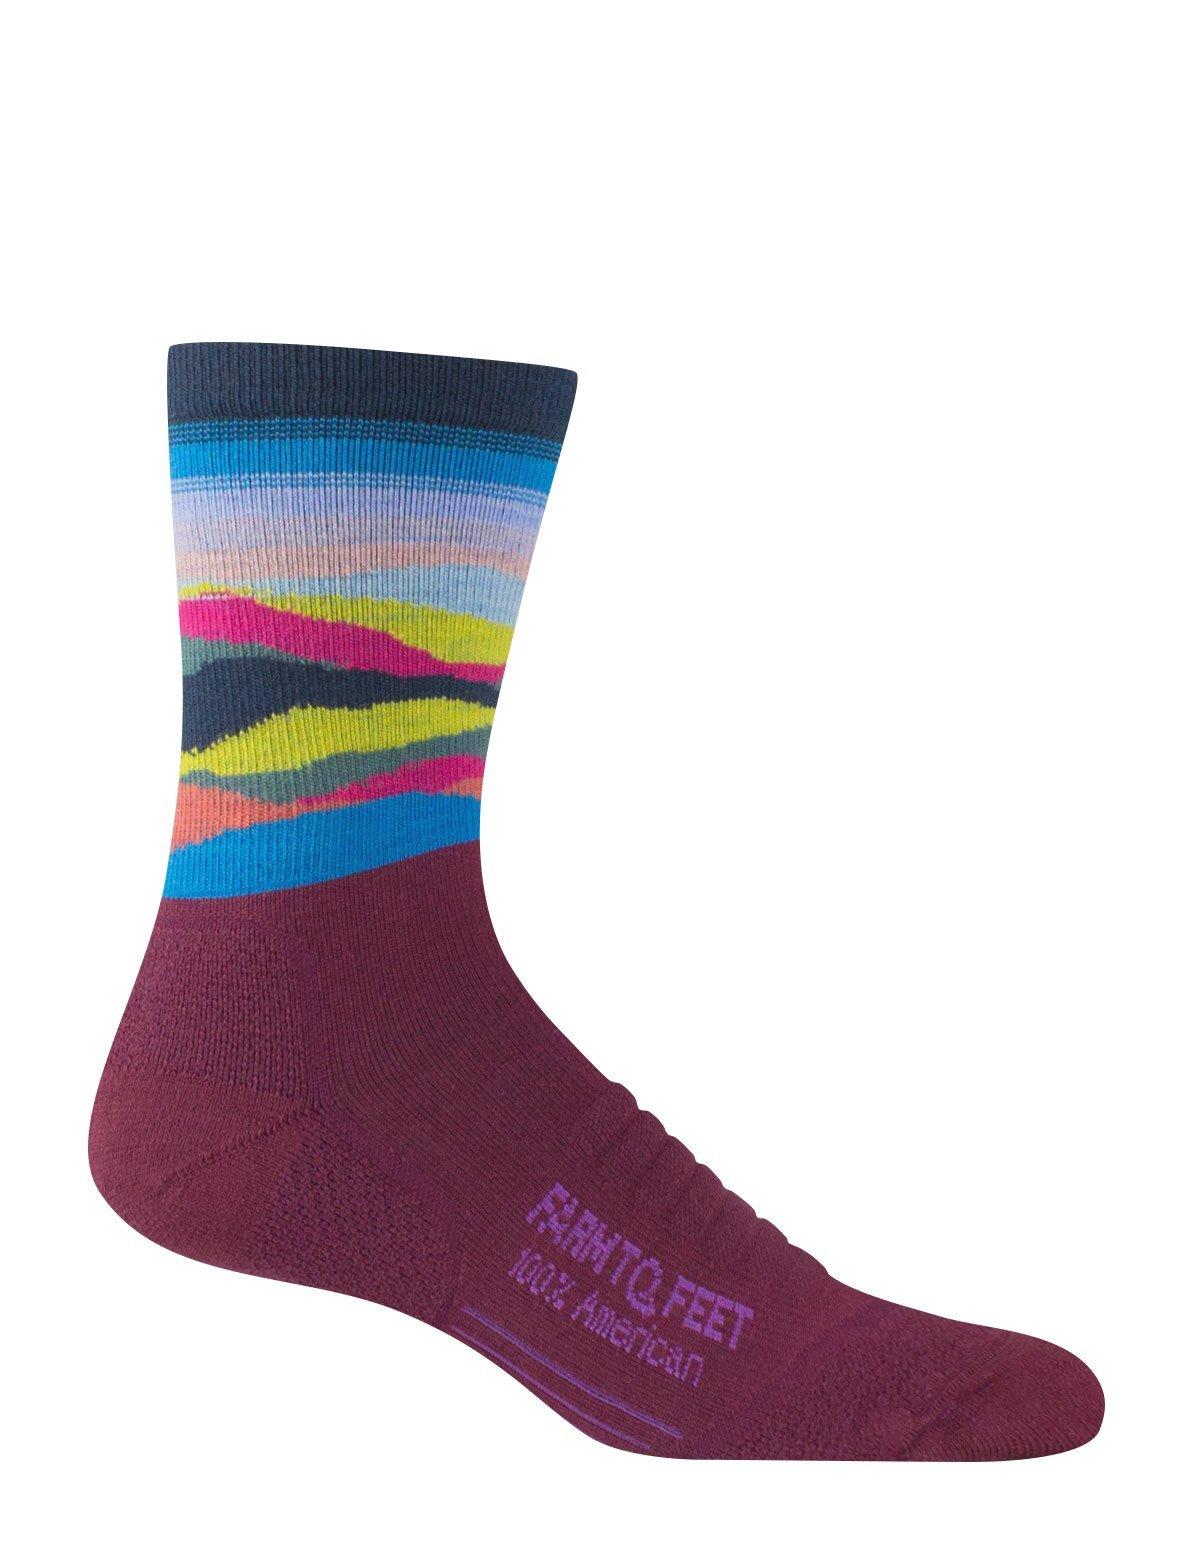 Farm To Feet Max Patch Lightweight 3/4 Women's Crew Sock